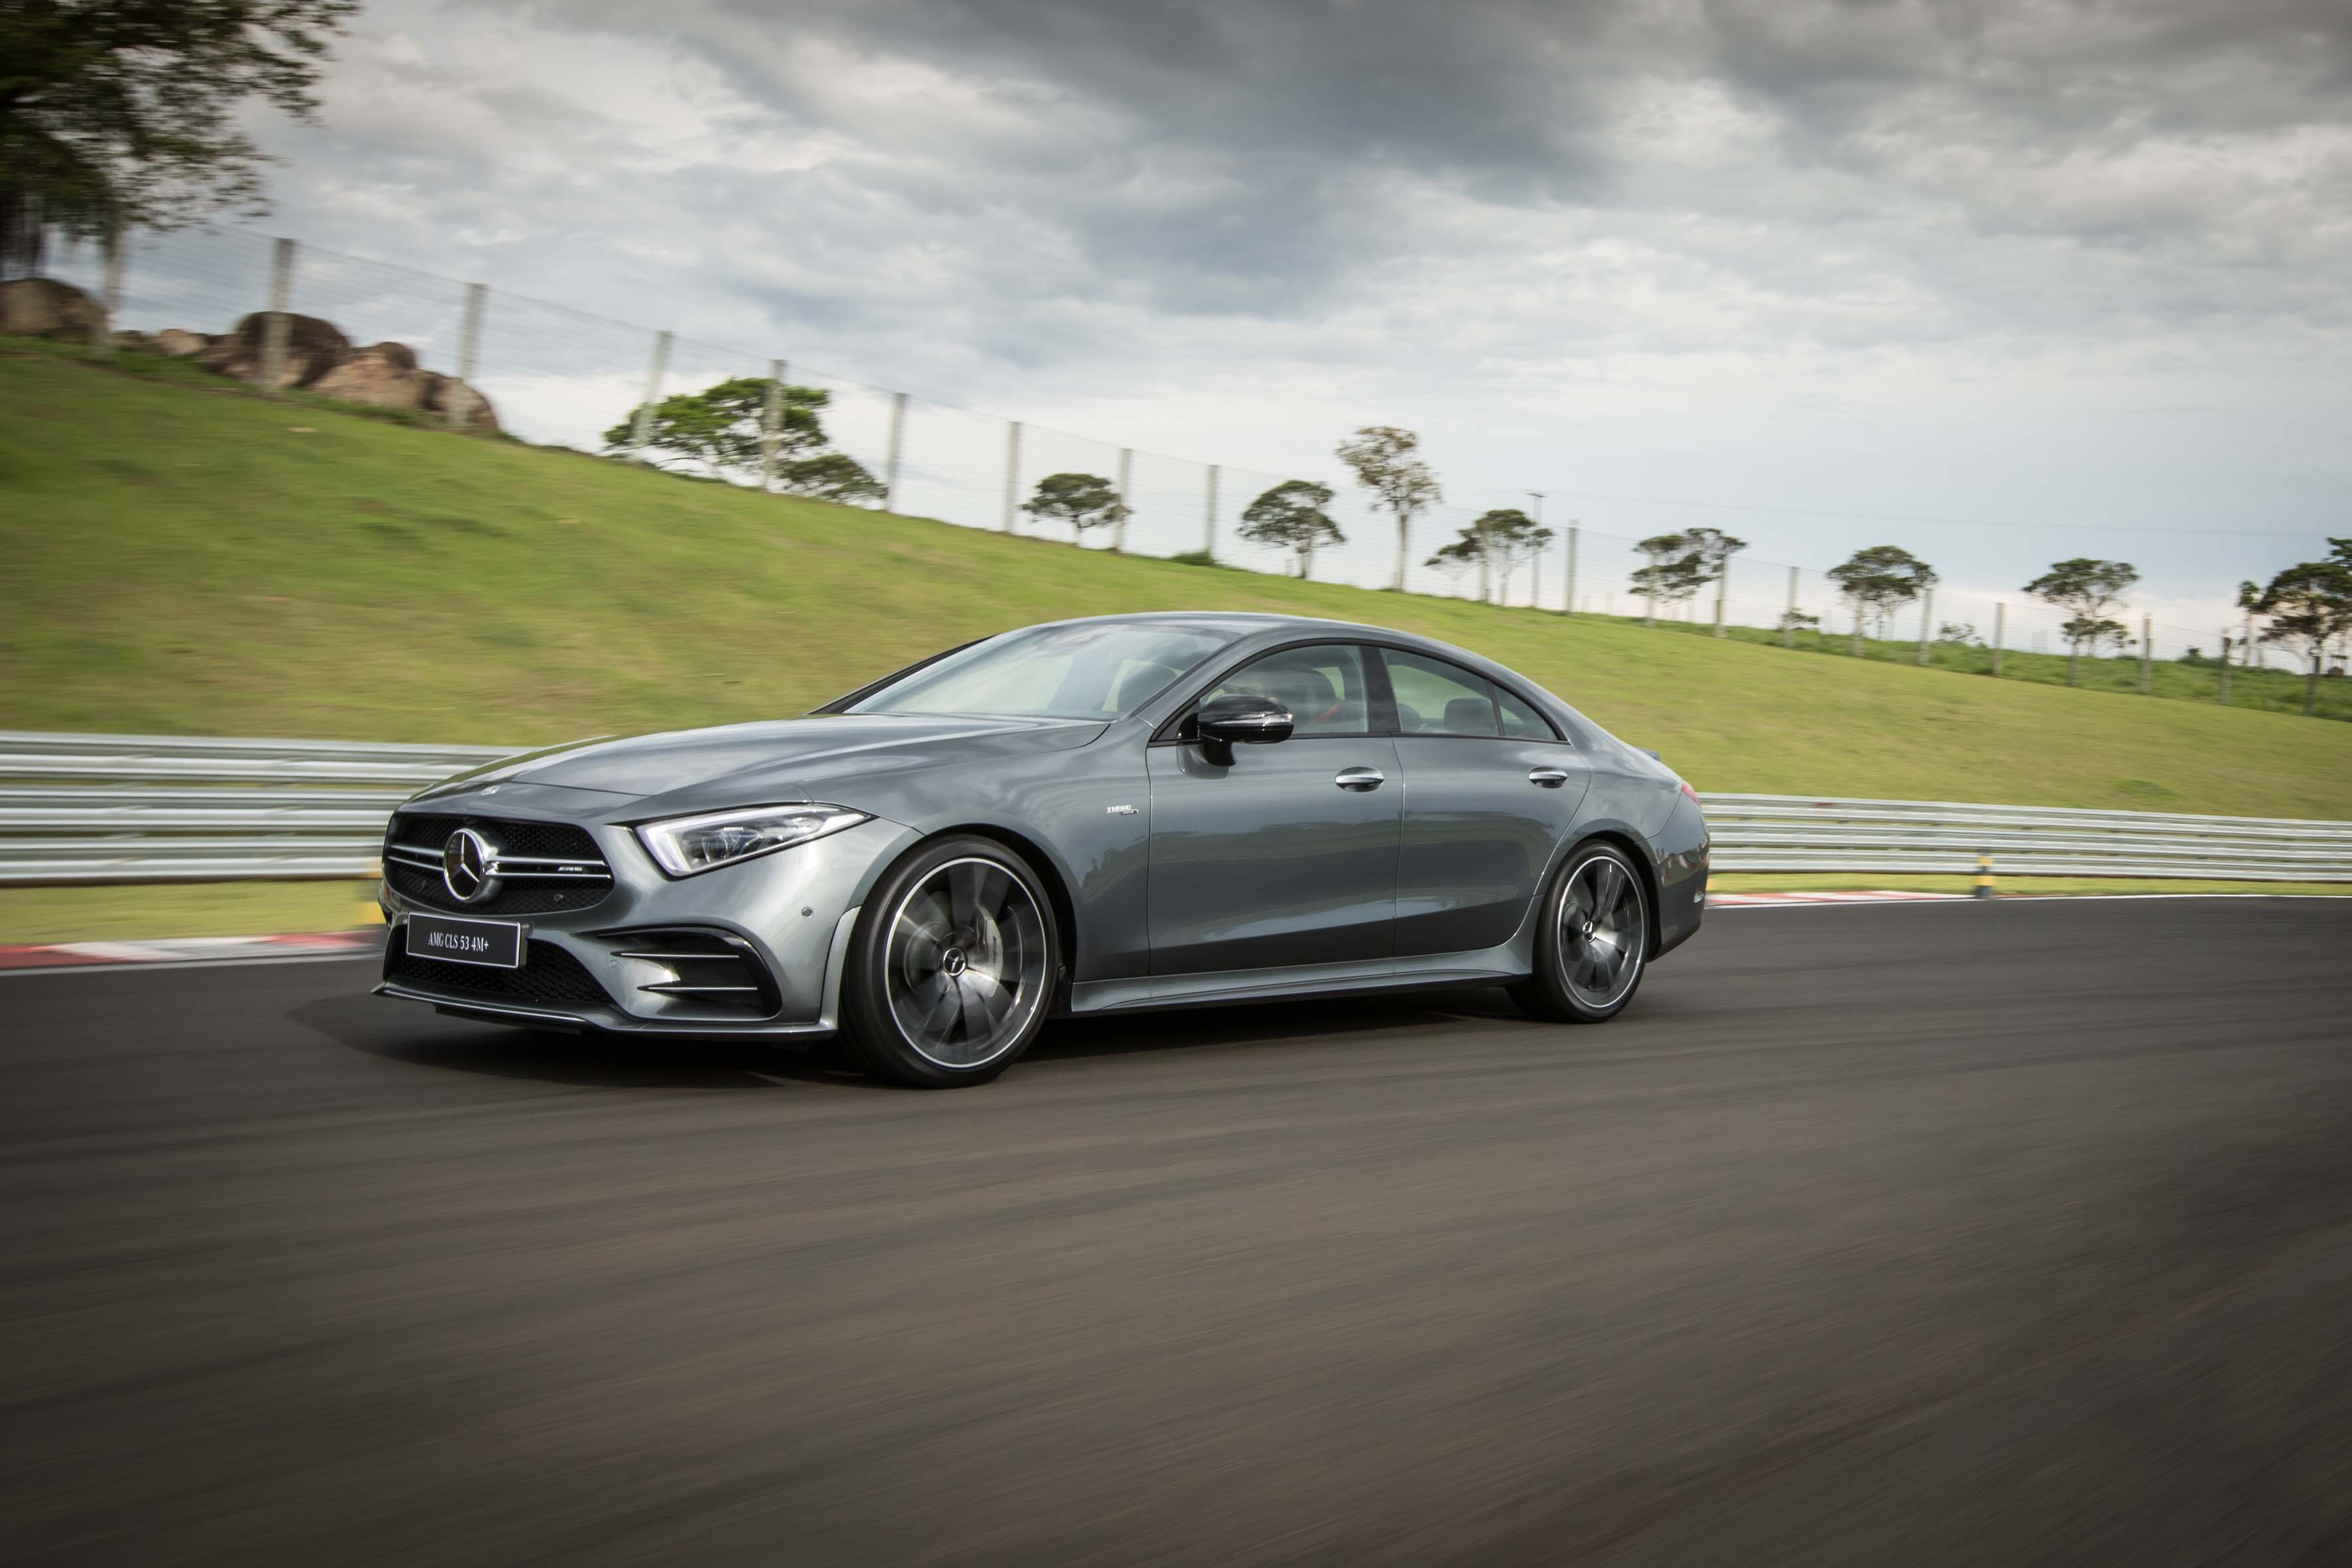 Mercedes-Benz AMG CLS 53 AMG Performance Tour 2018